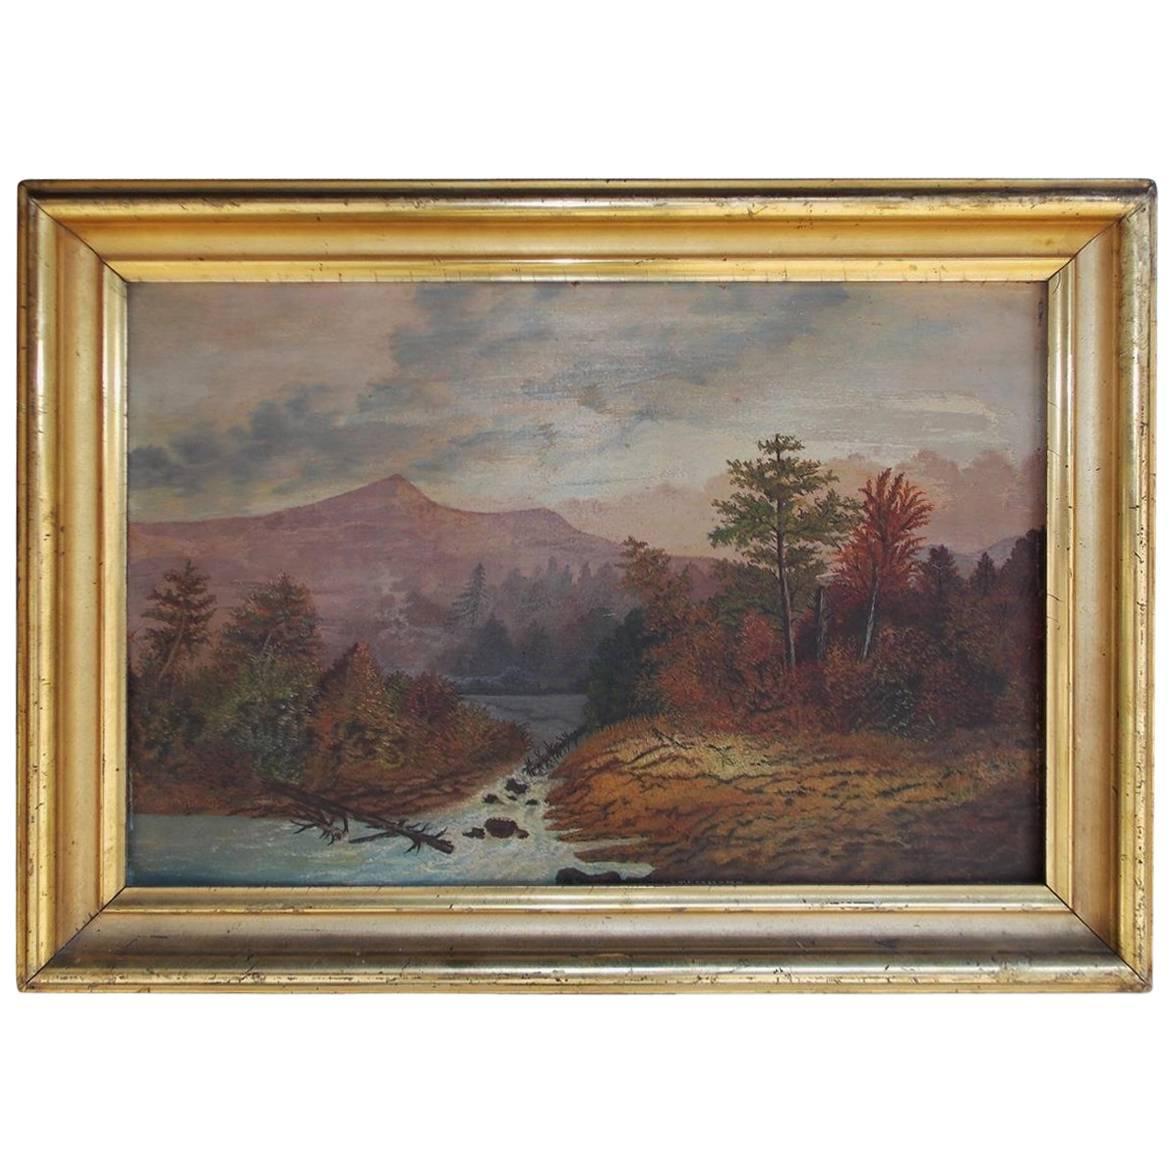 American Oil Framed Landscape on Academy Board, Hudson Valley, Circa 1820